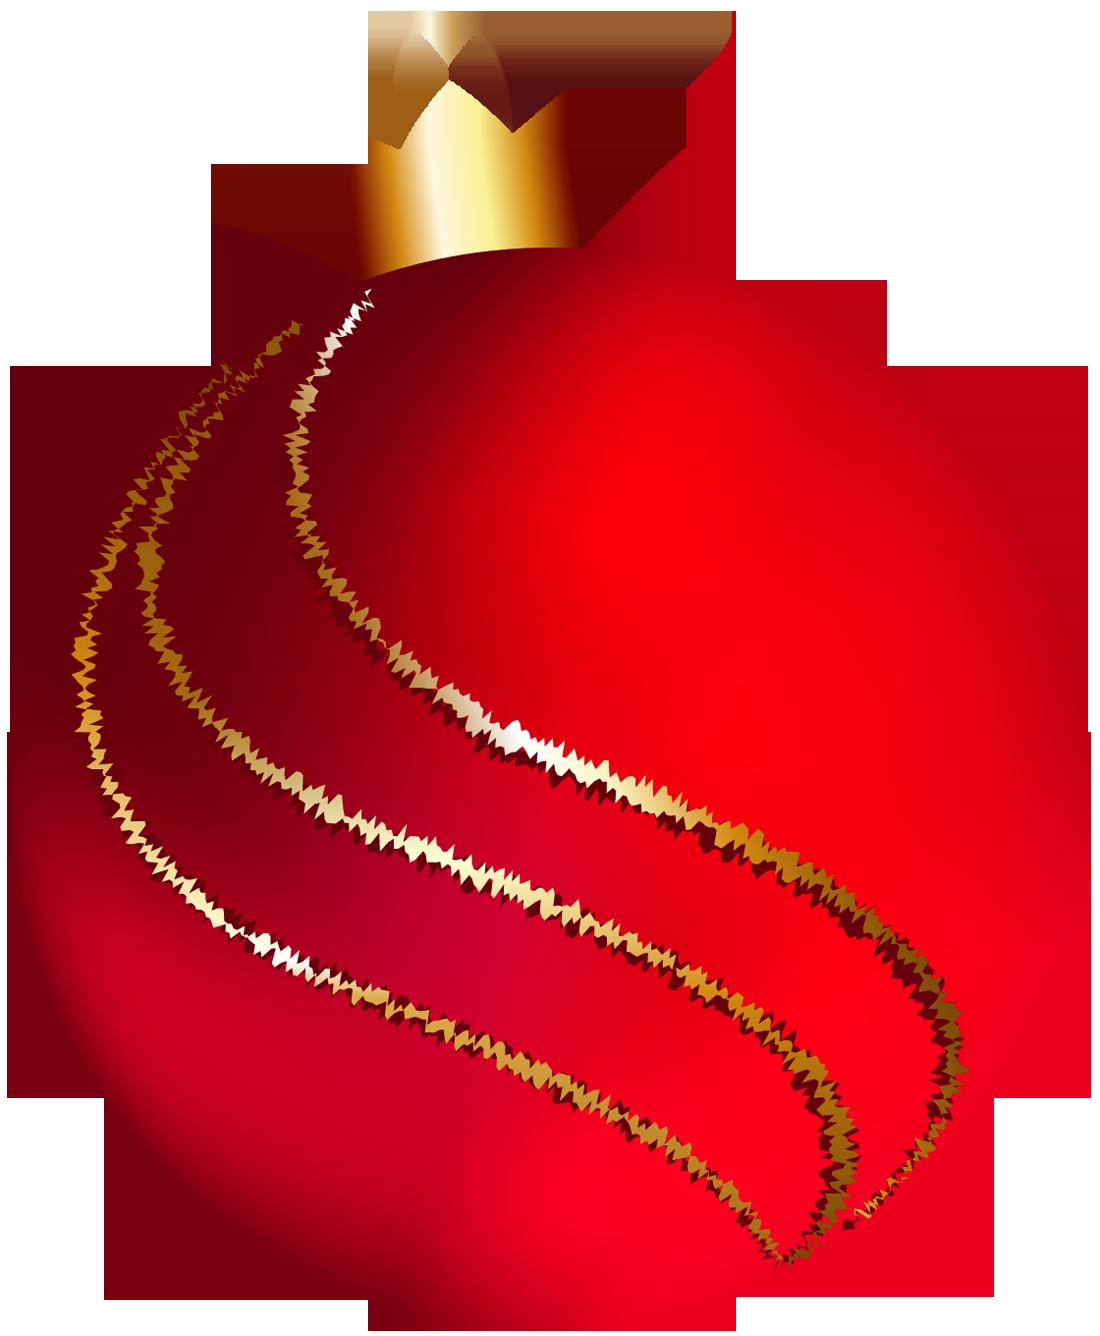 image ornaments clip art 9i4q7r4ie png glee tv show wiki rh glee wikia com ornaments clip art free ornament clipart christmas